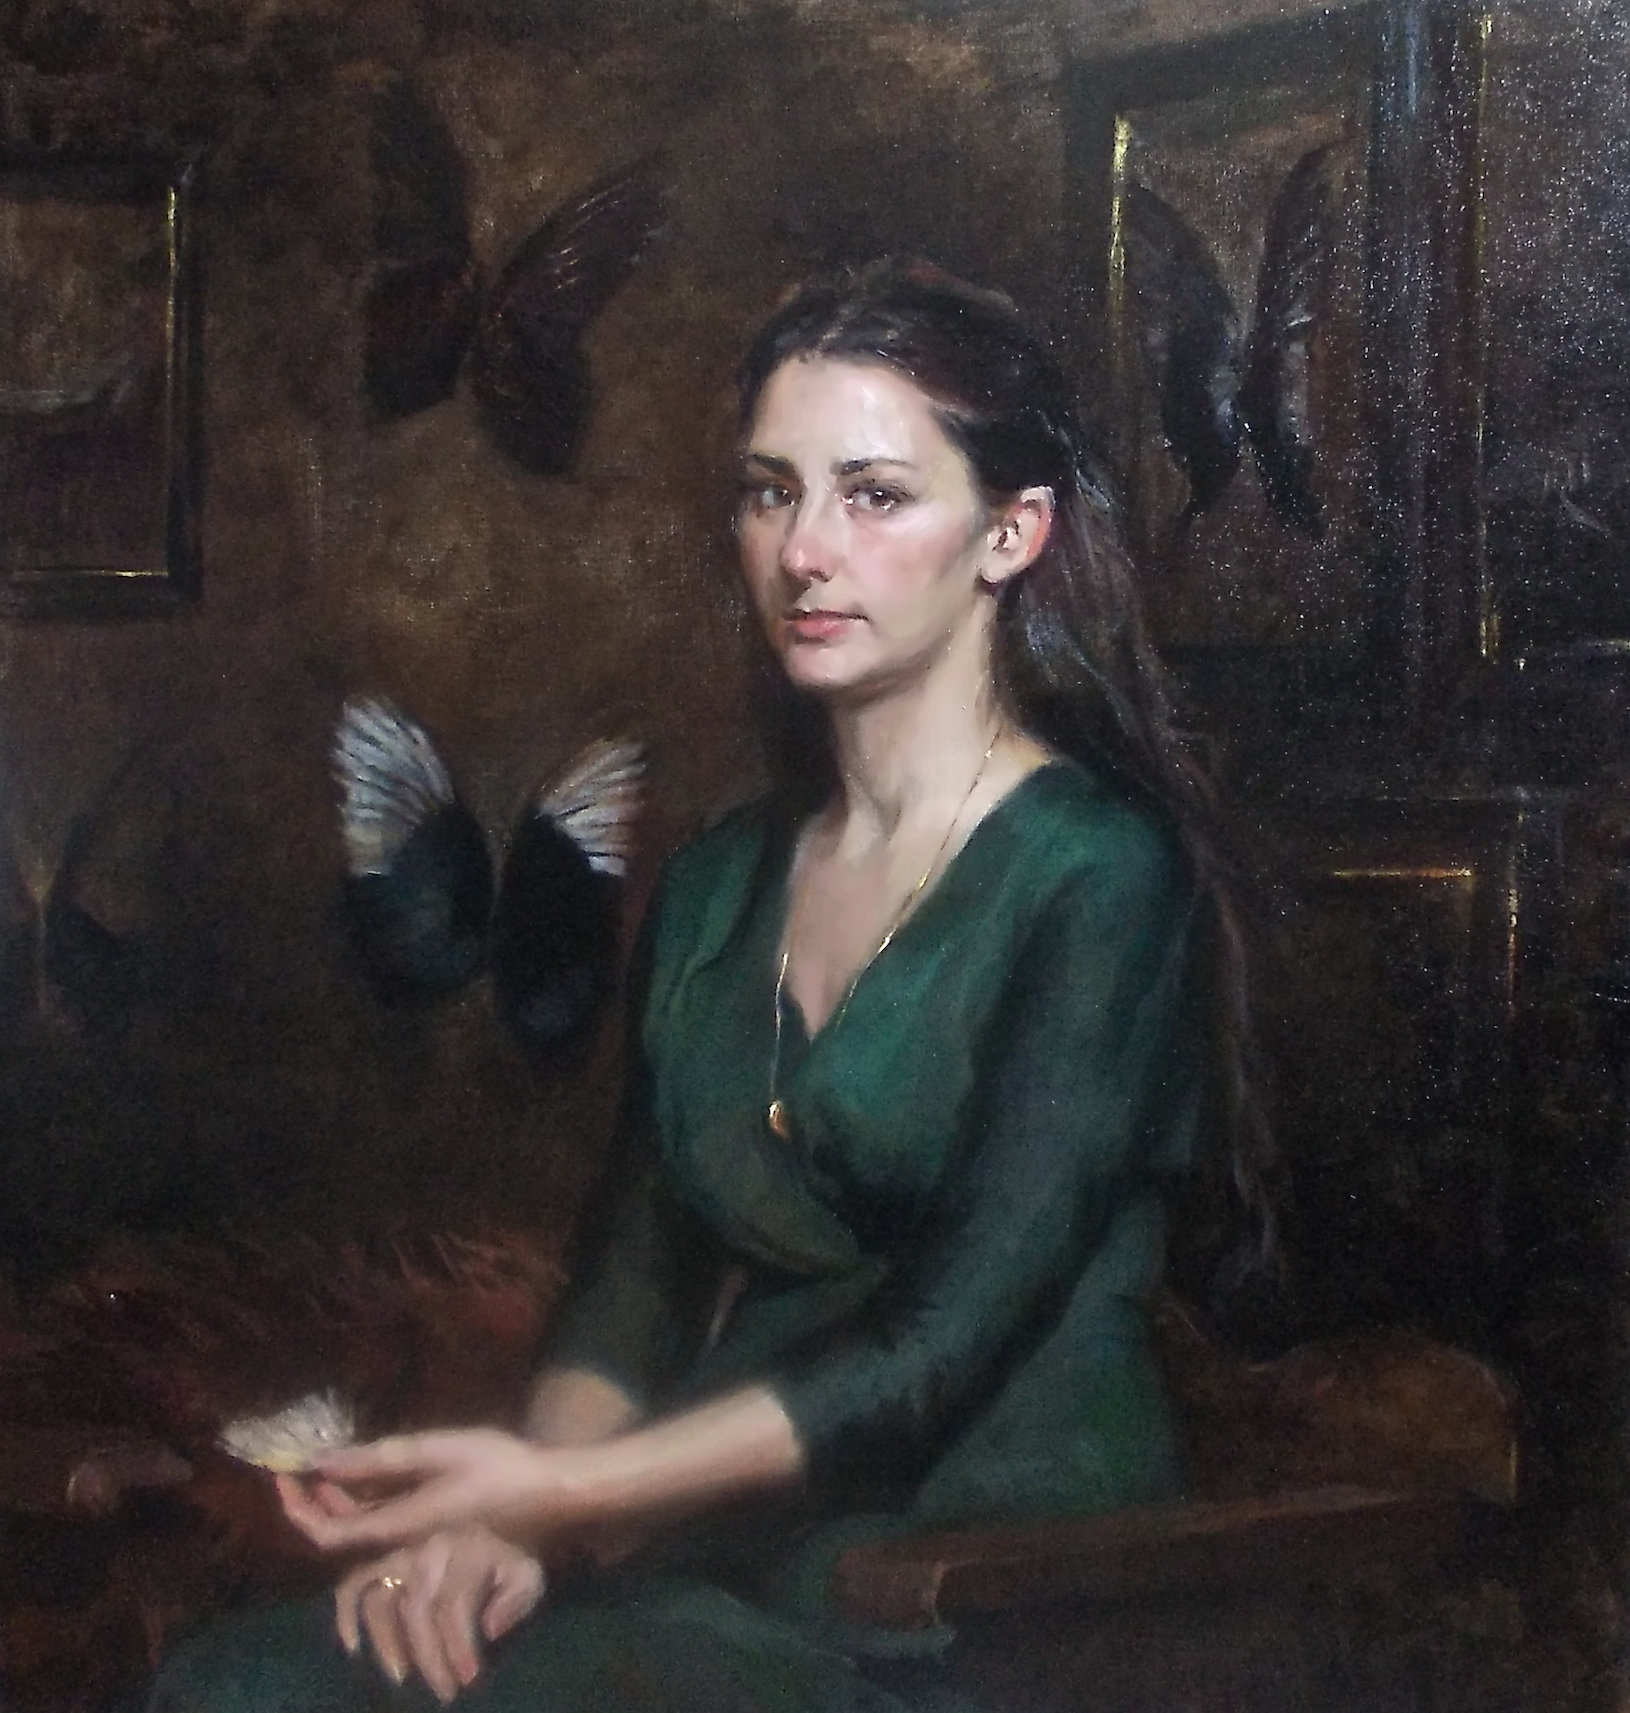 'Amy' 100 cm x 95 cm Oil on linen